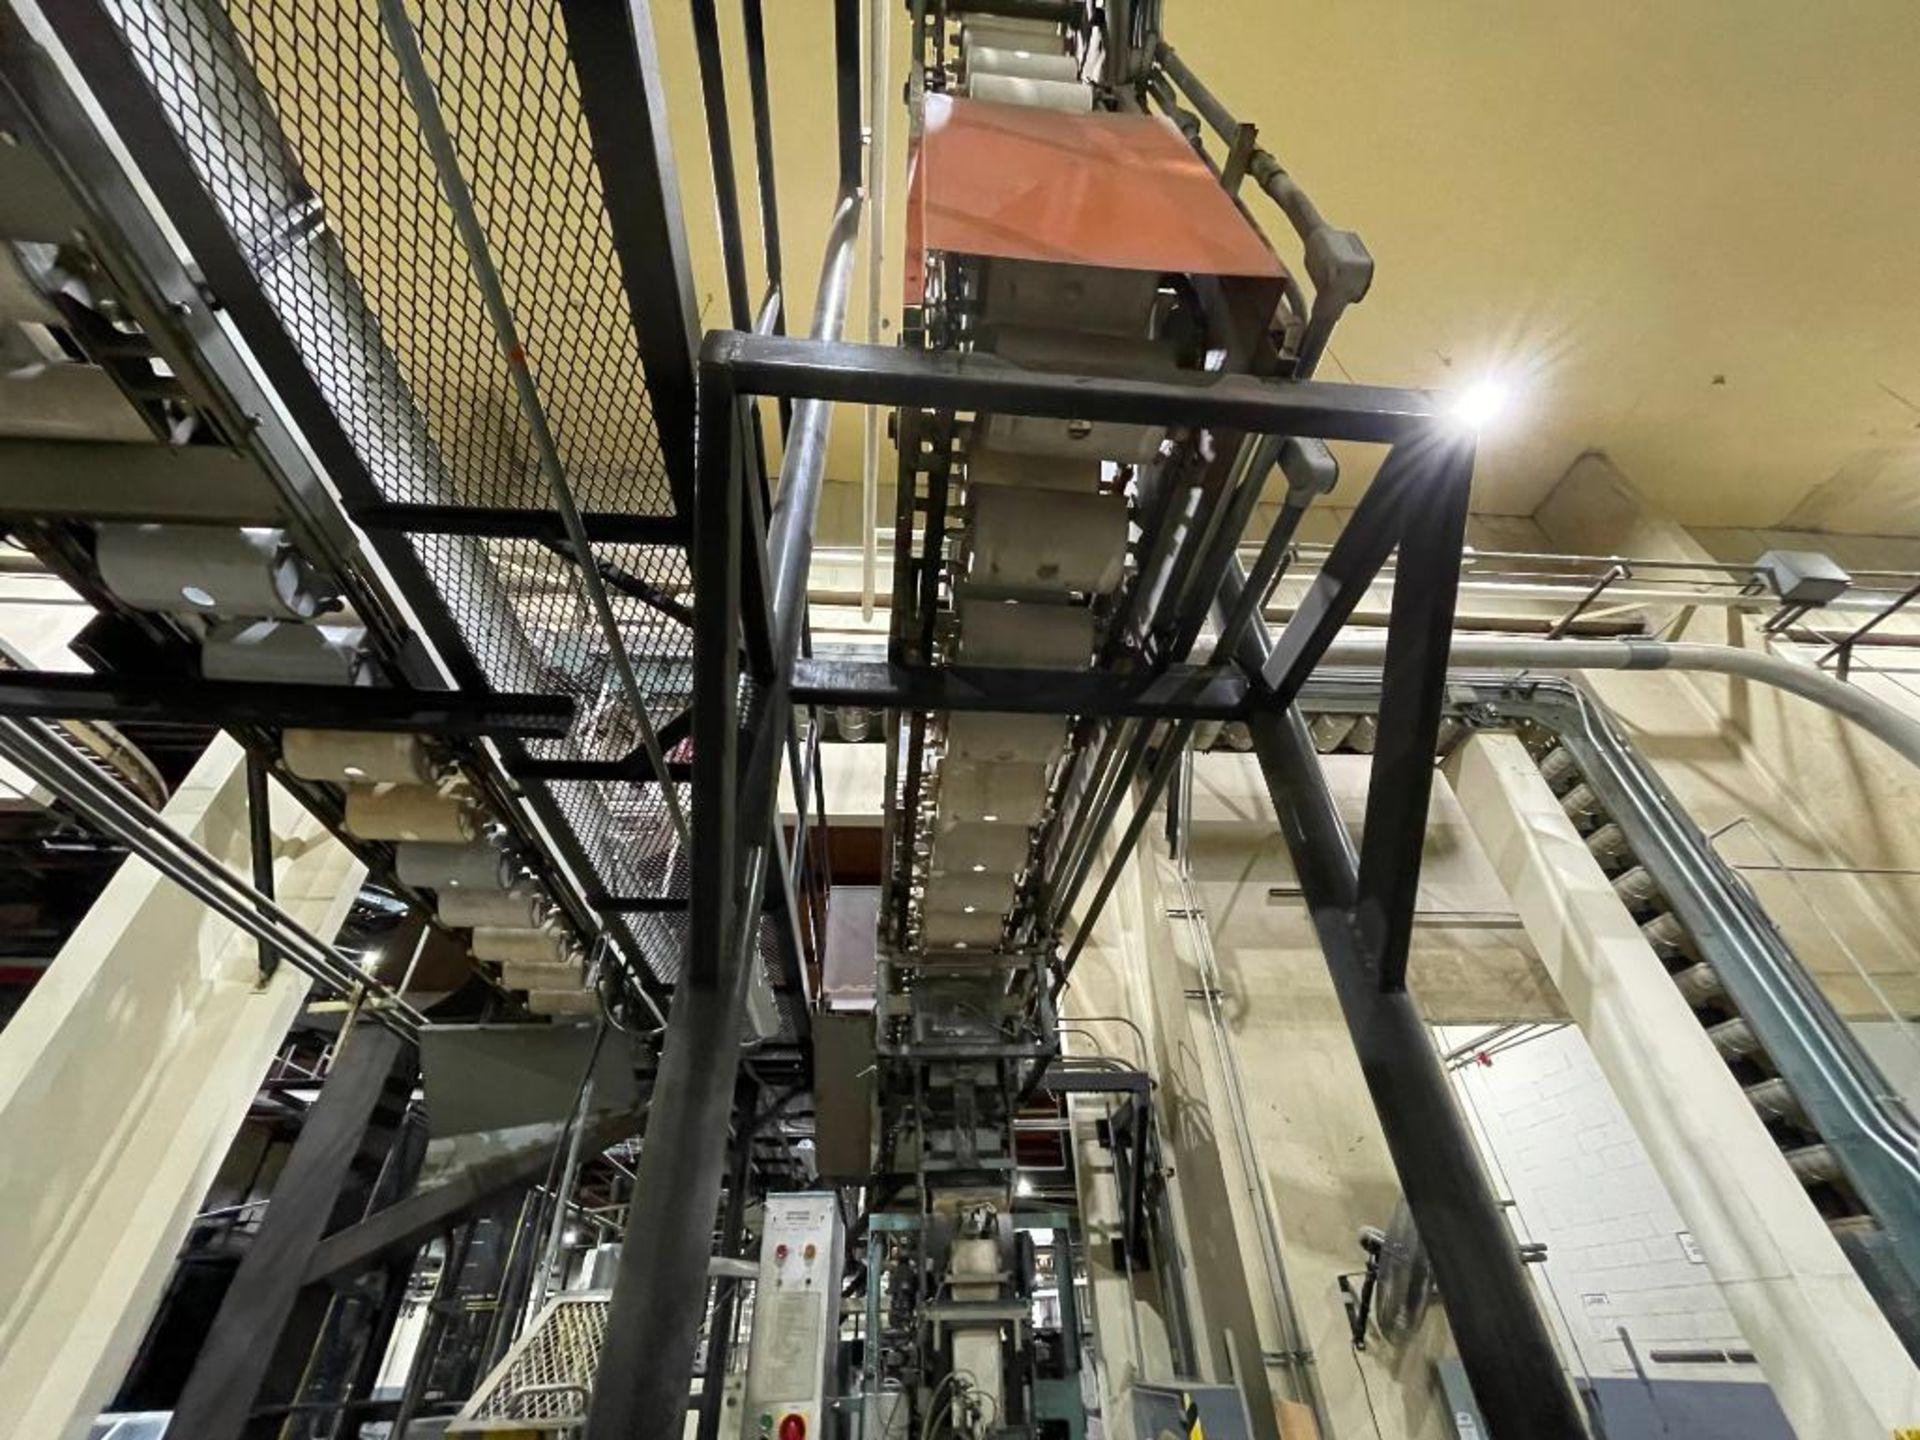 Meyer horizontal bucket elevator, model PC-072-12-BCC - Image 15 of 18